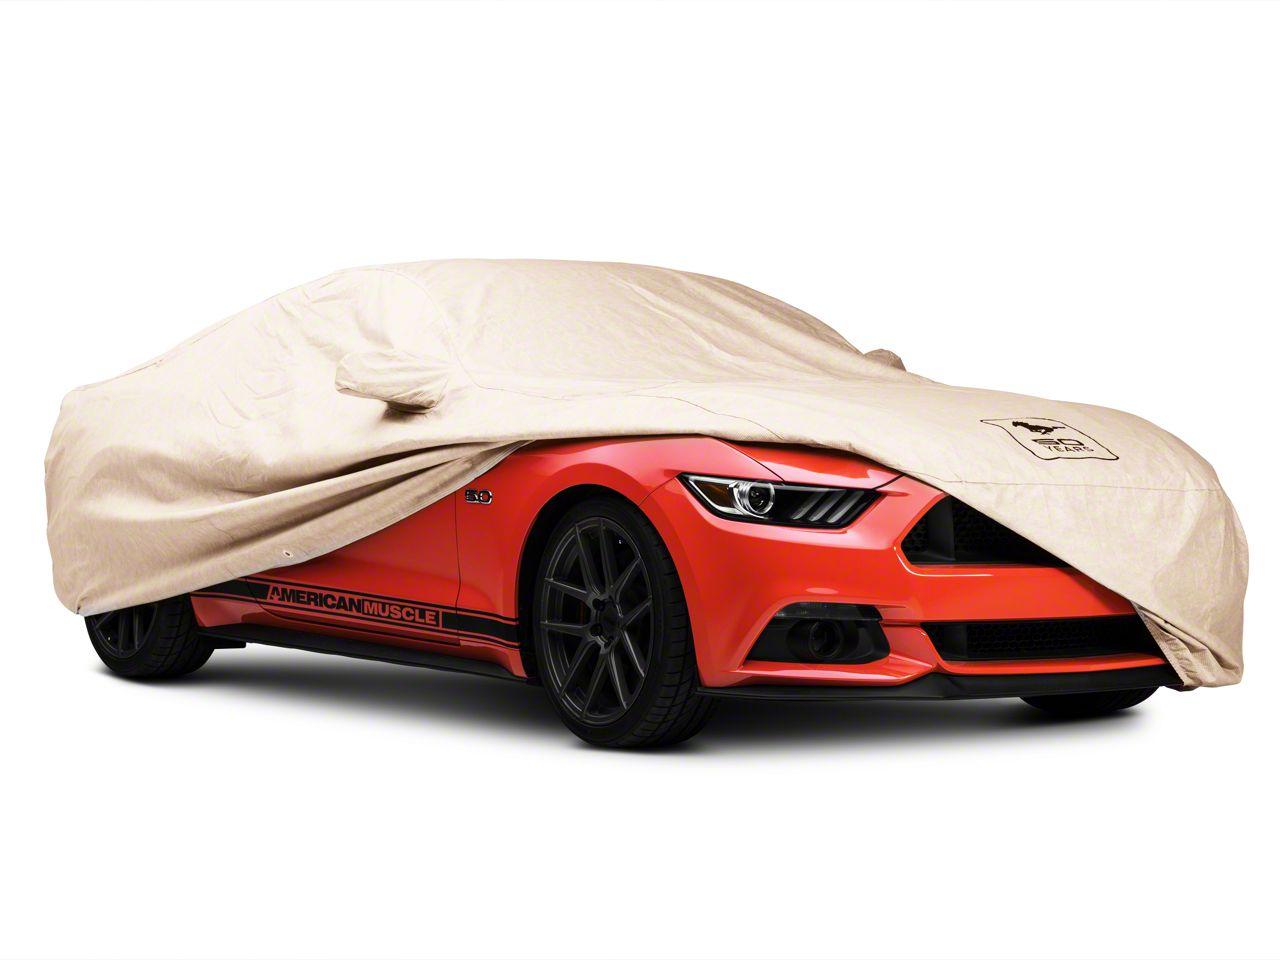 Black Covercraft Custom Fit Car Cover for Select Volvo C70 Models Fleeced Satin FS16963F5